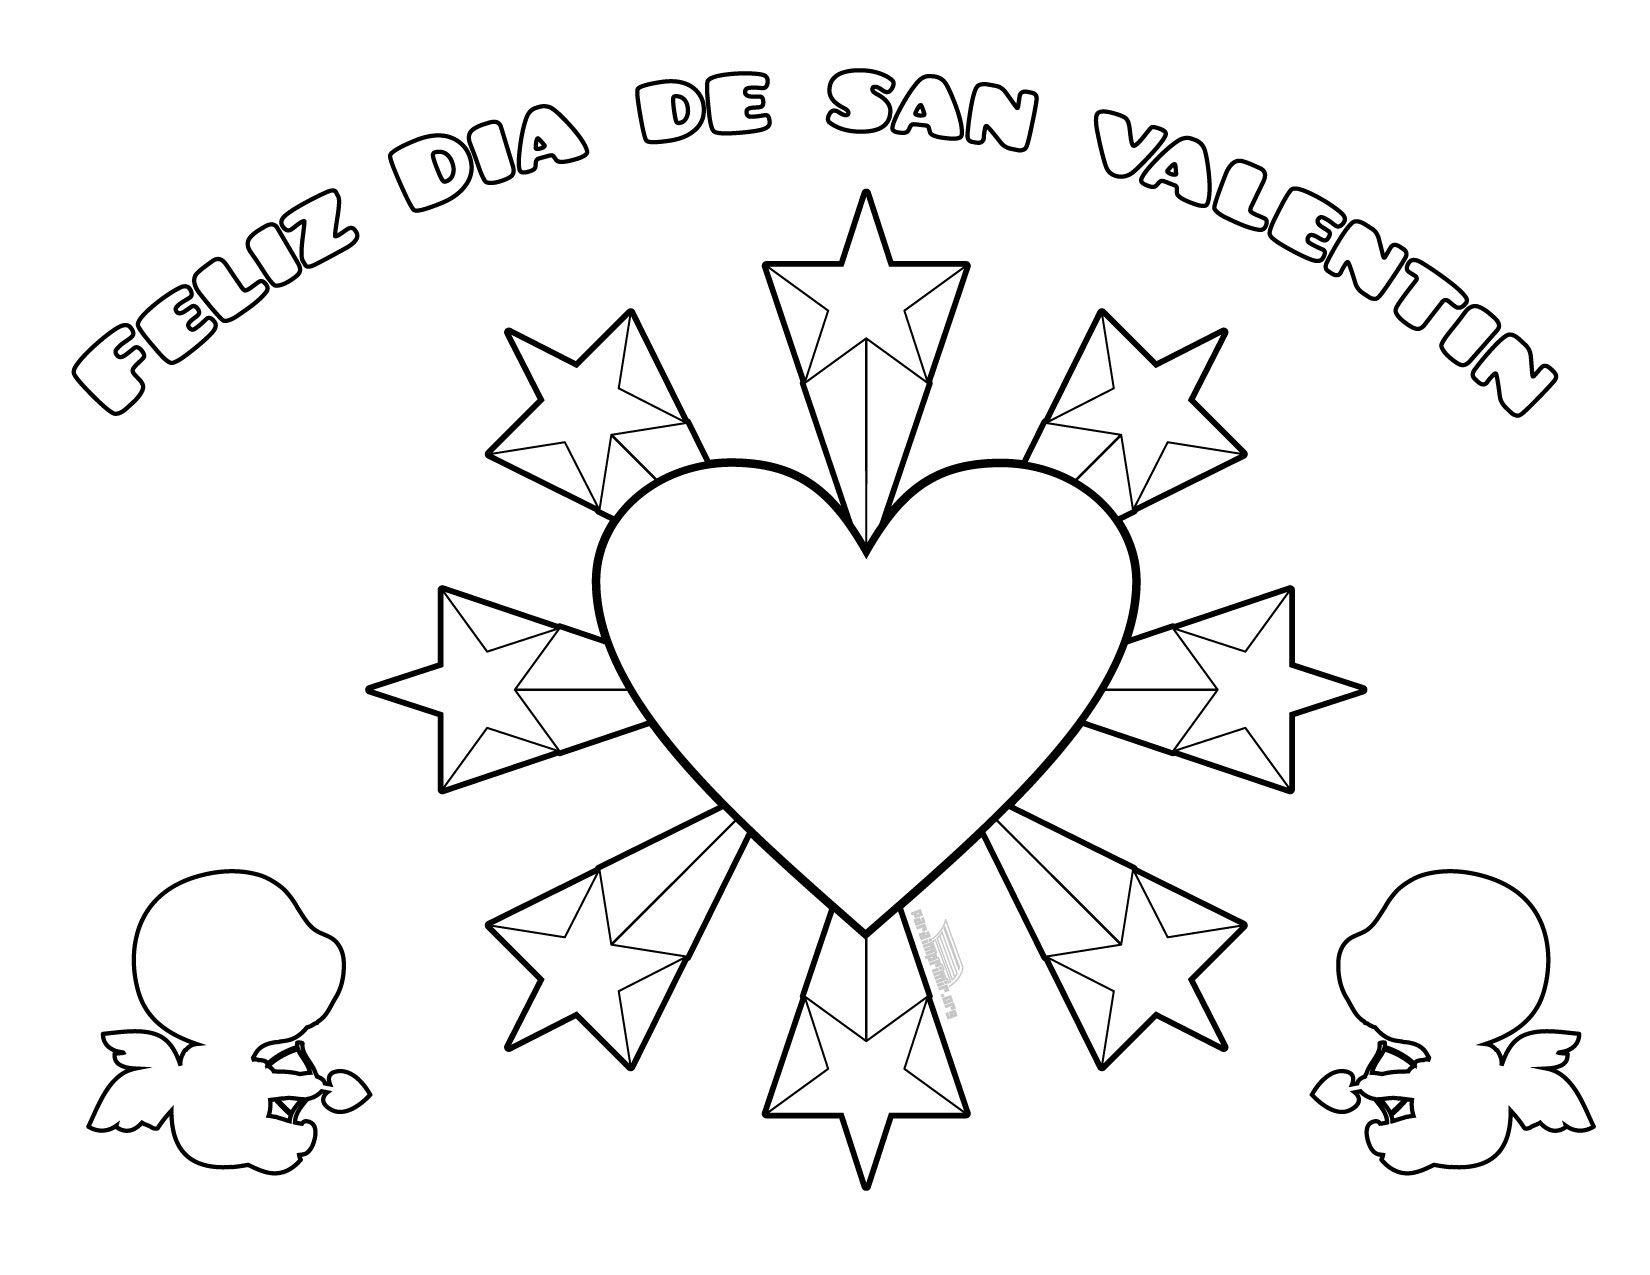 Imagenes Del Dia De San Valentin Para Colorear Imagenes Del Dia